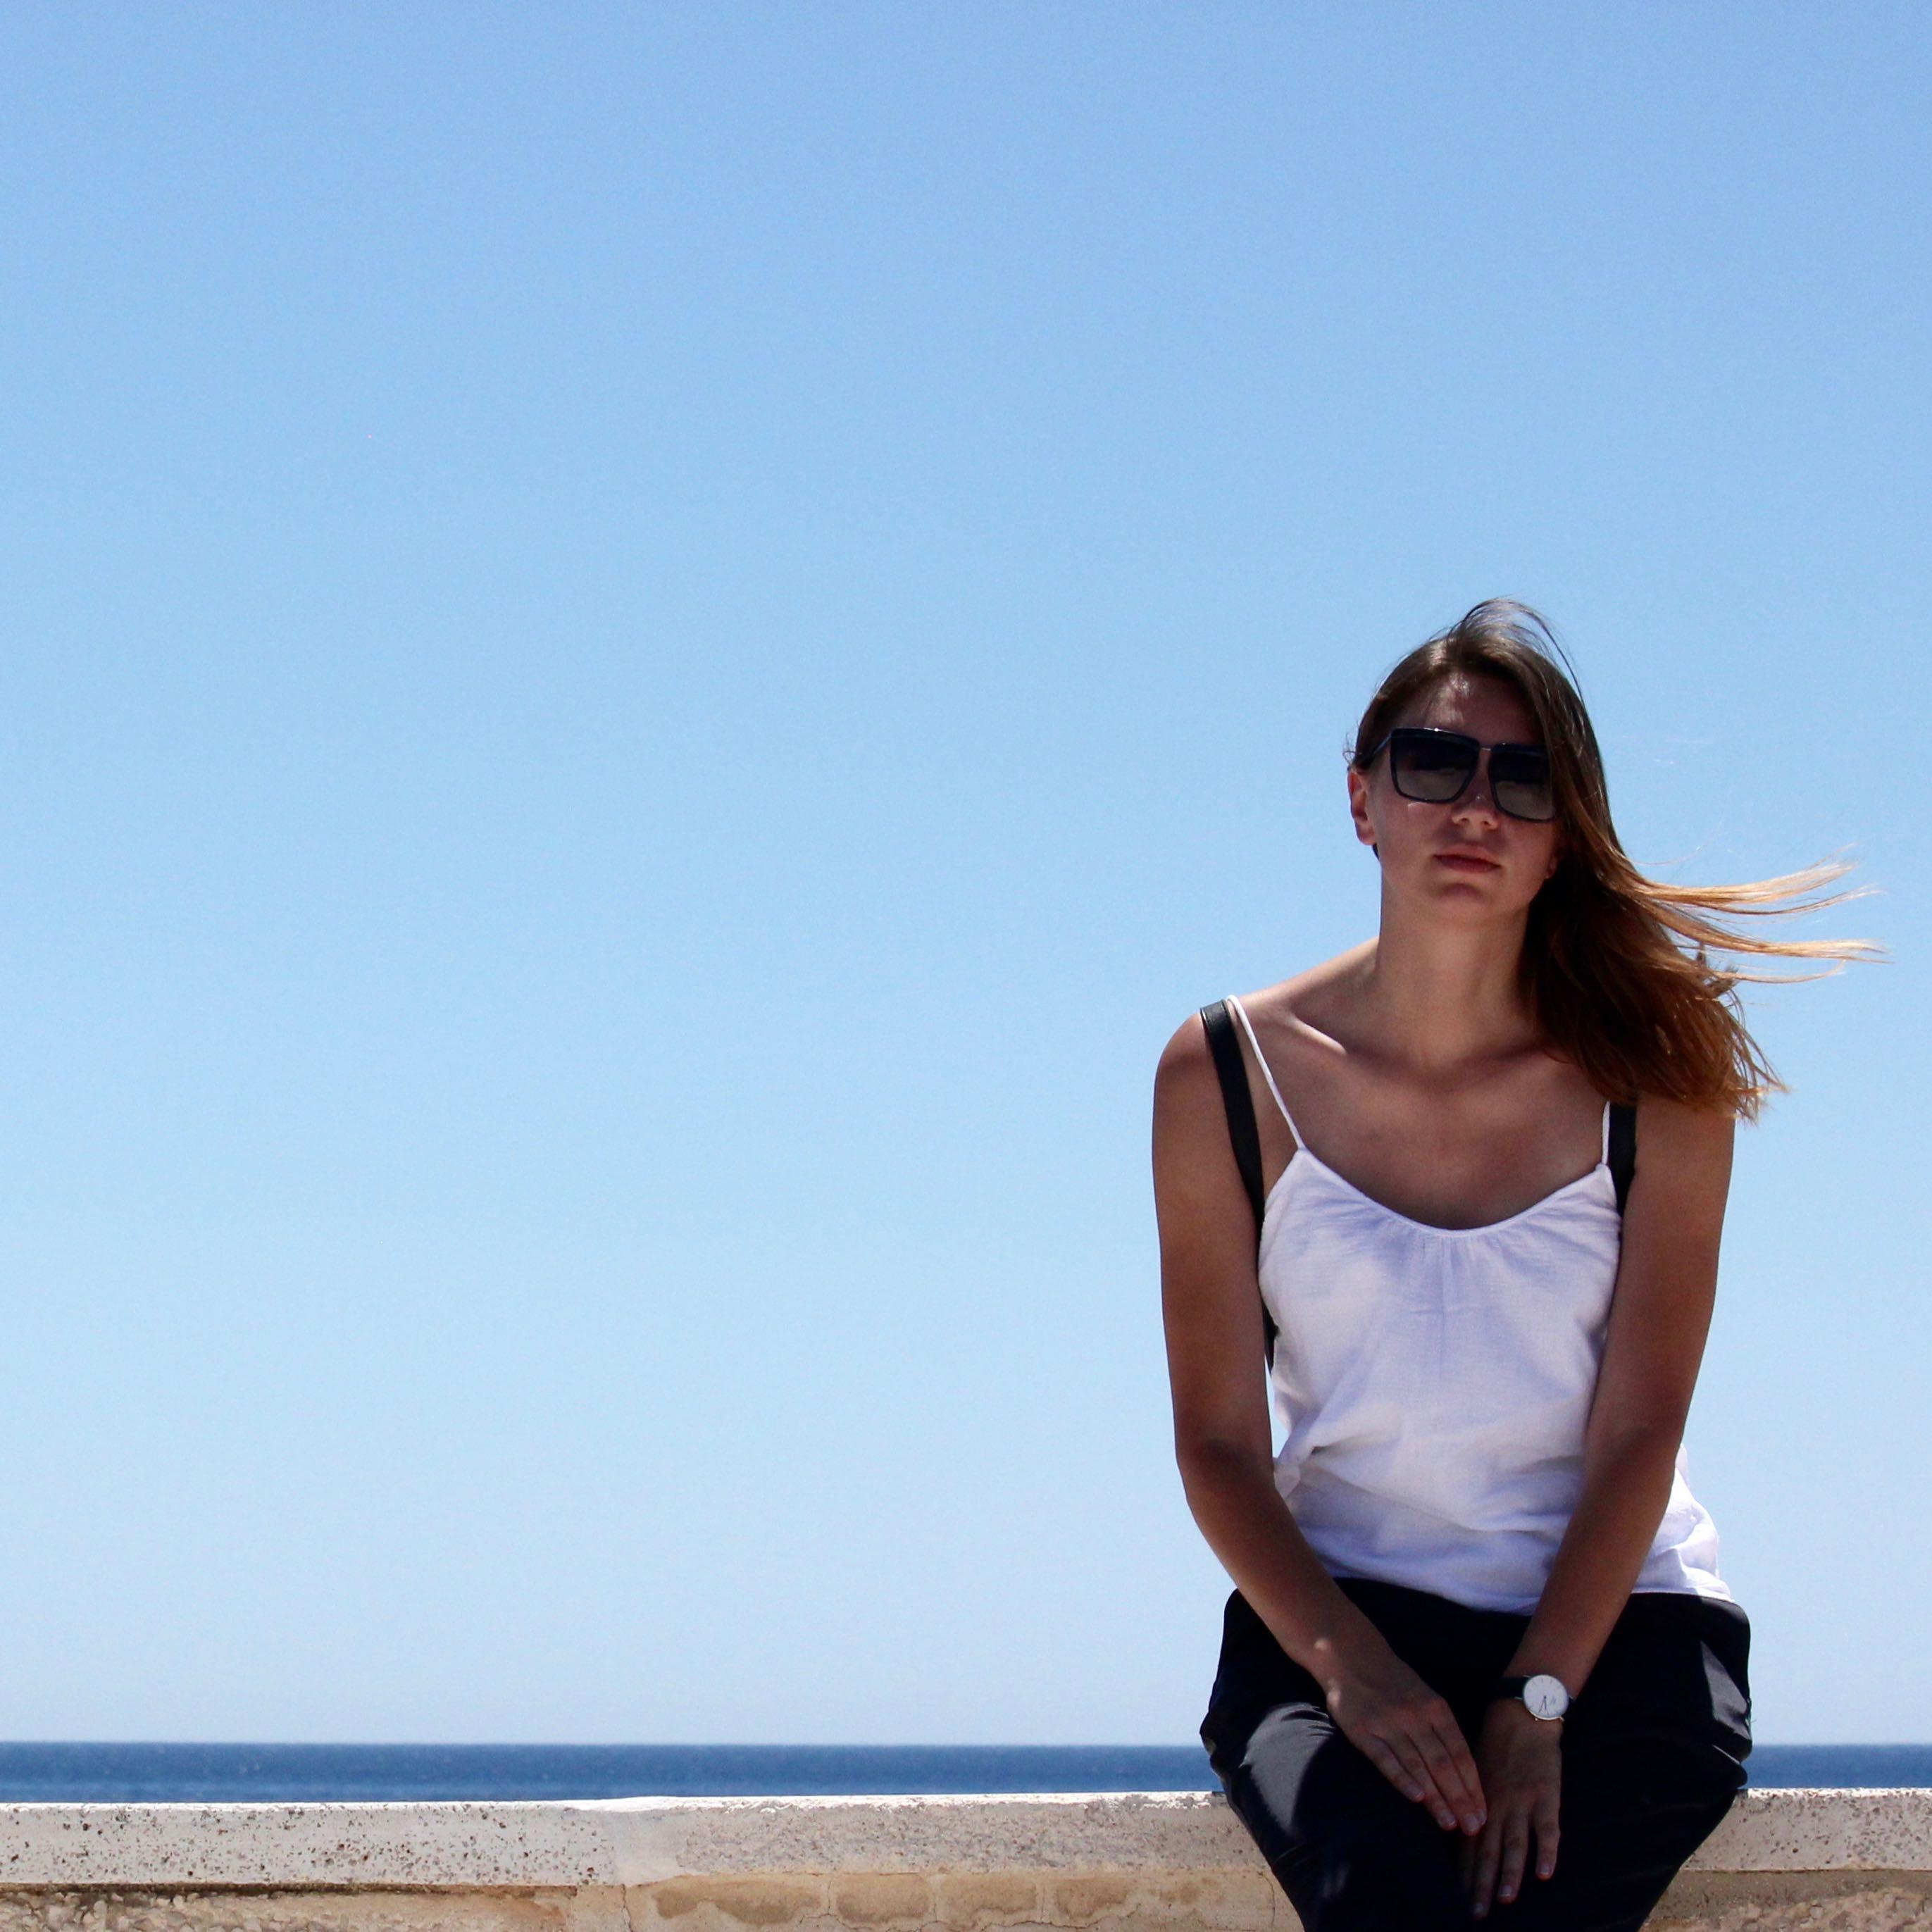 Calp, Spain 24